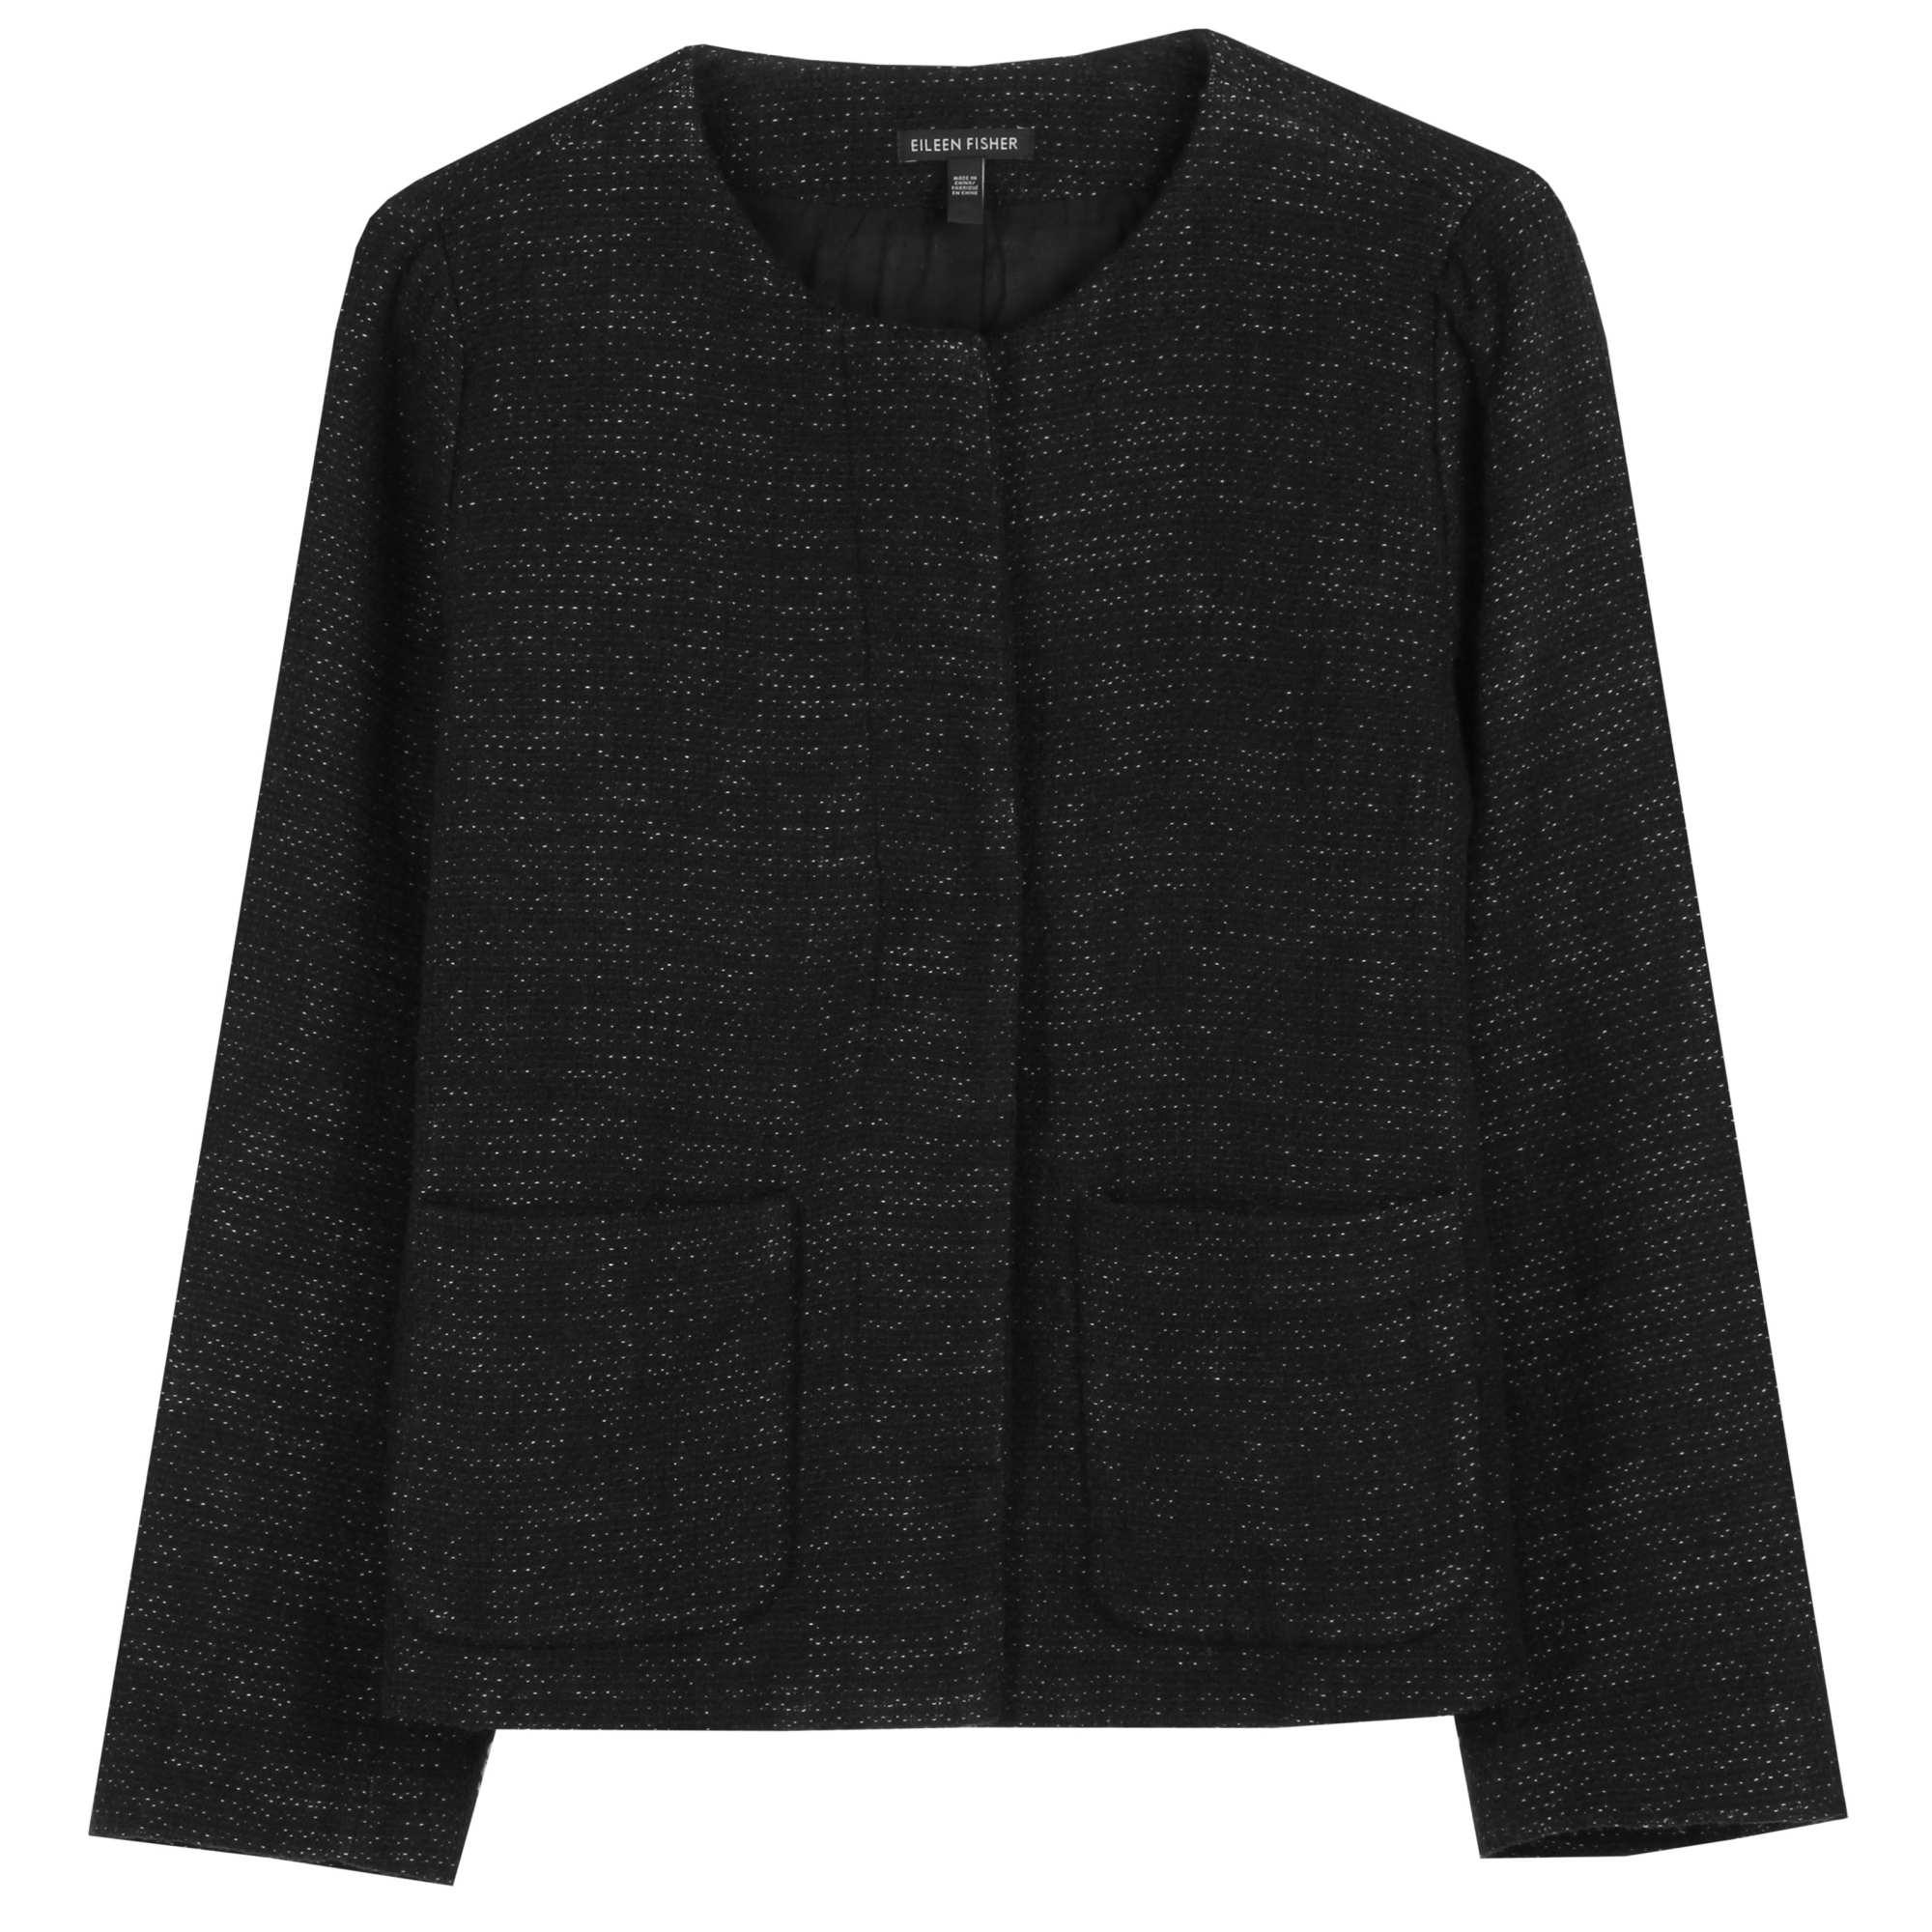 Stitched Cotton Linen Tweed Jacket